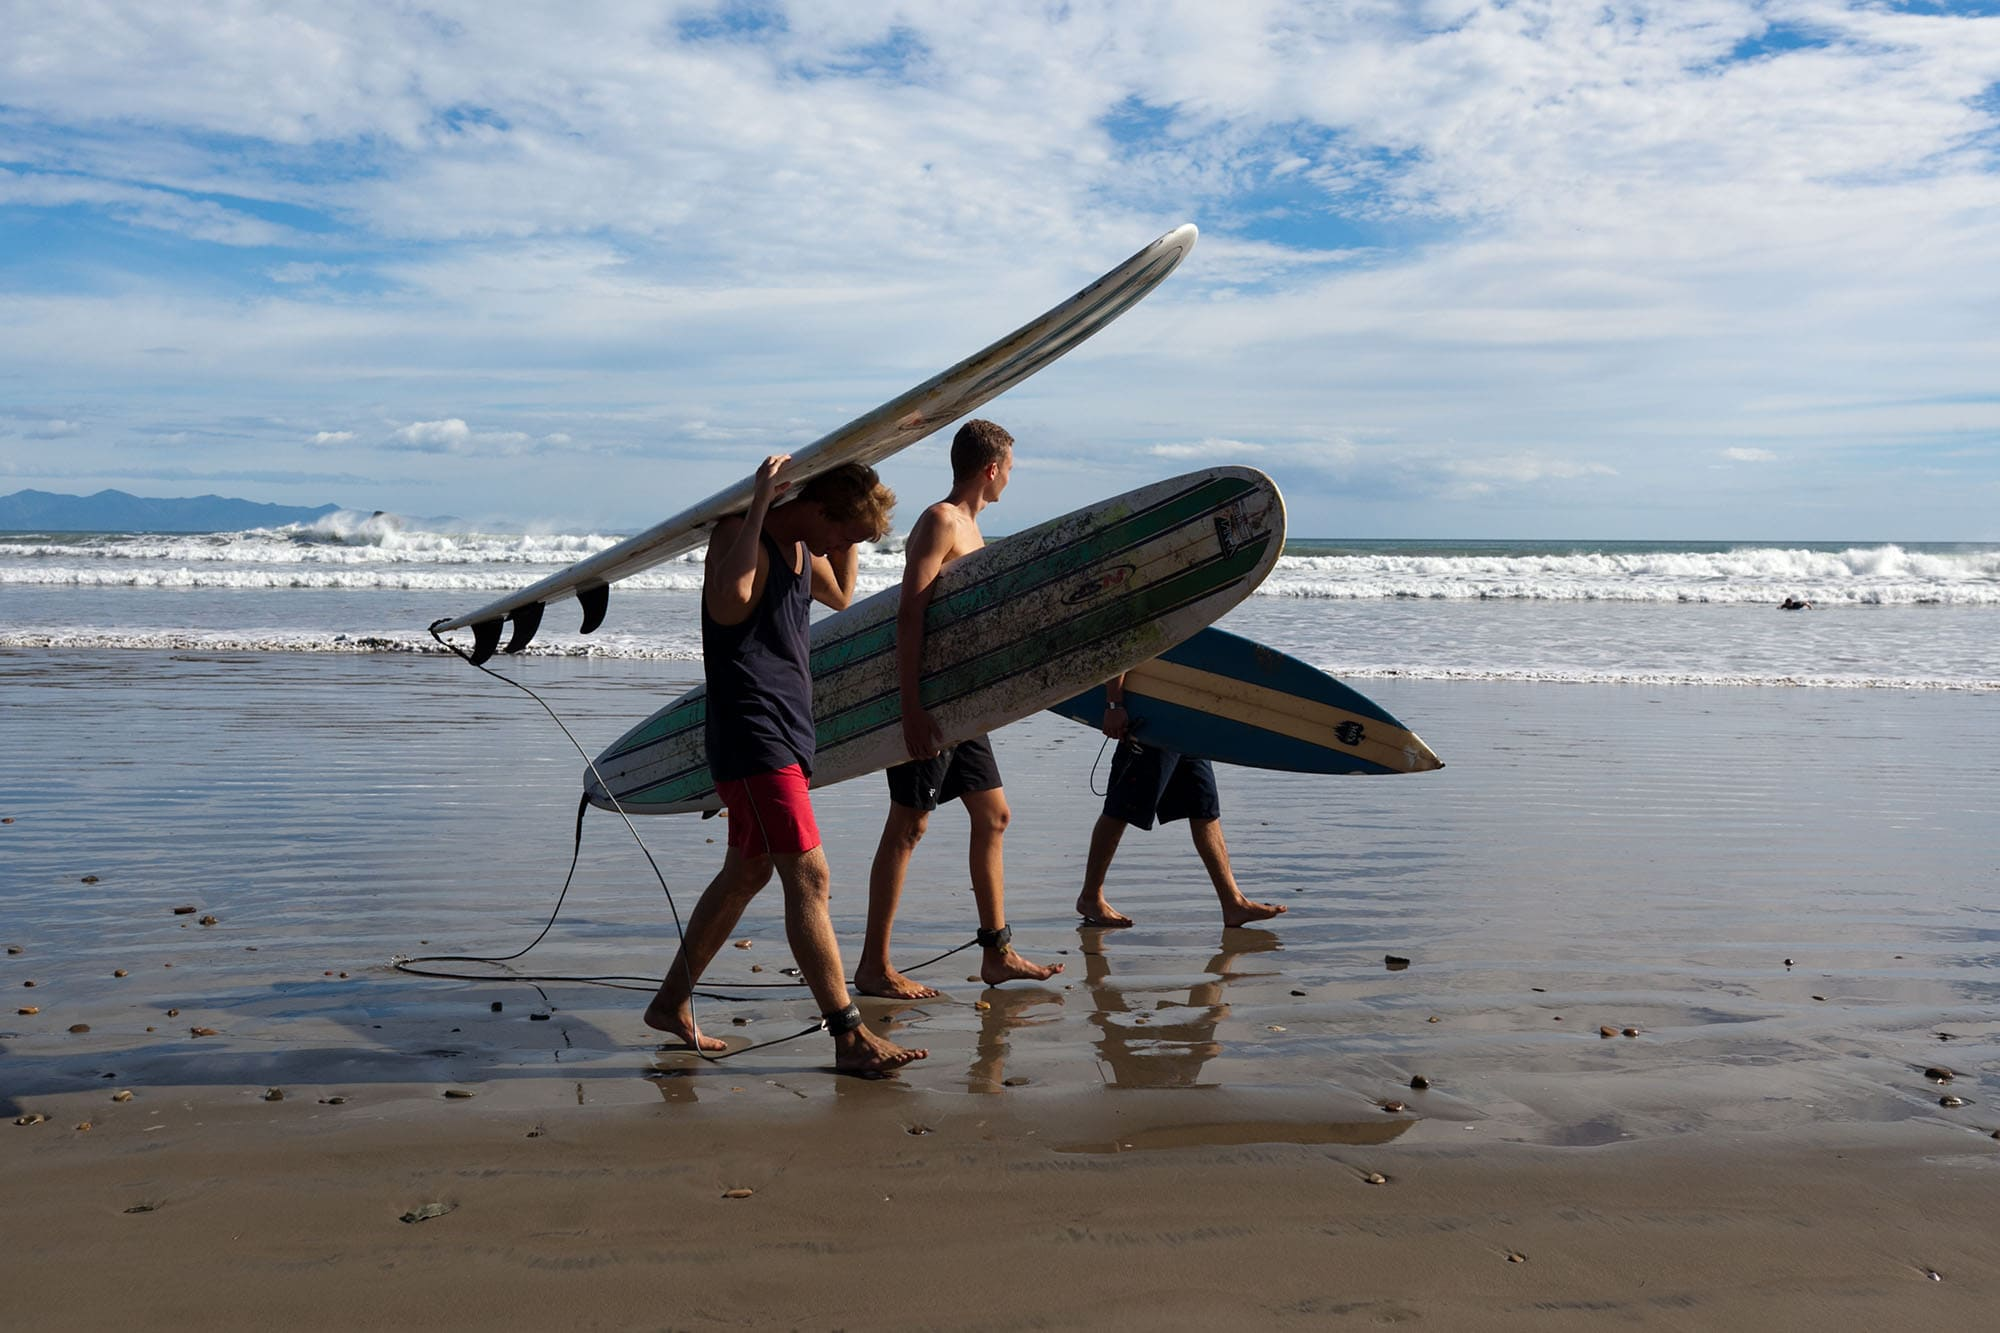 Surfing on Hermosa Beach, Nicaragua